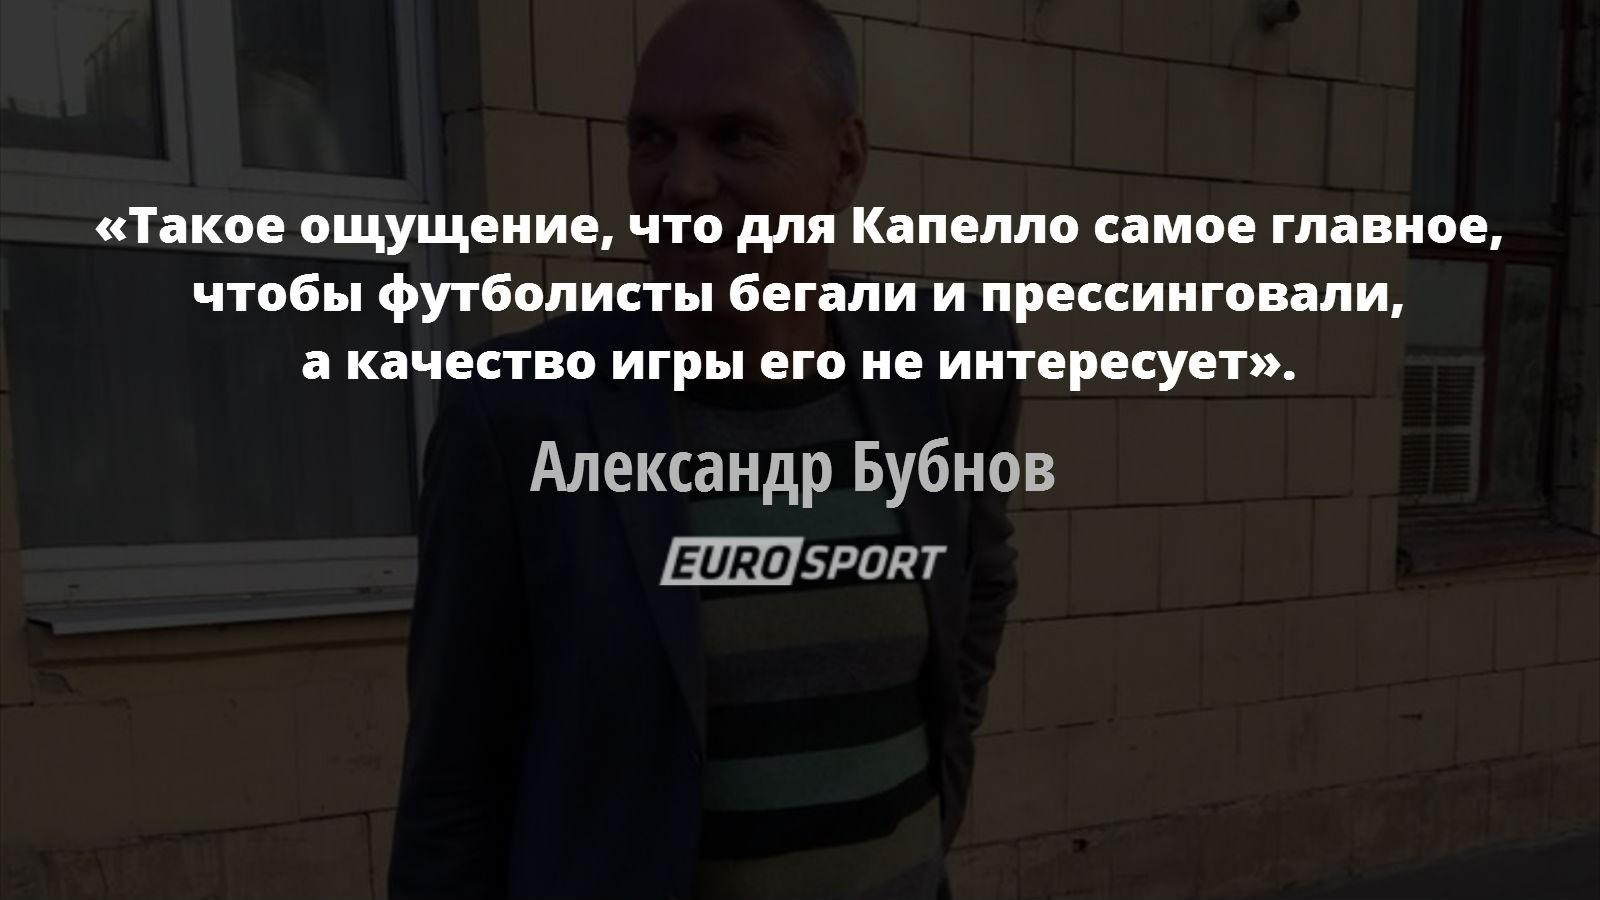 https://i.eurosport.com/2015/07/13/1639199.jpg